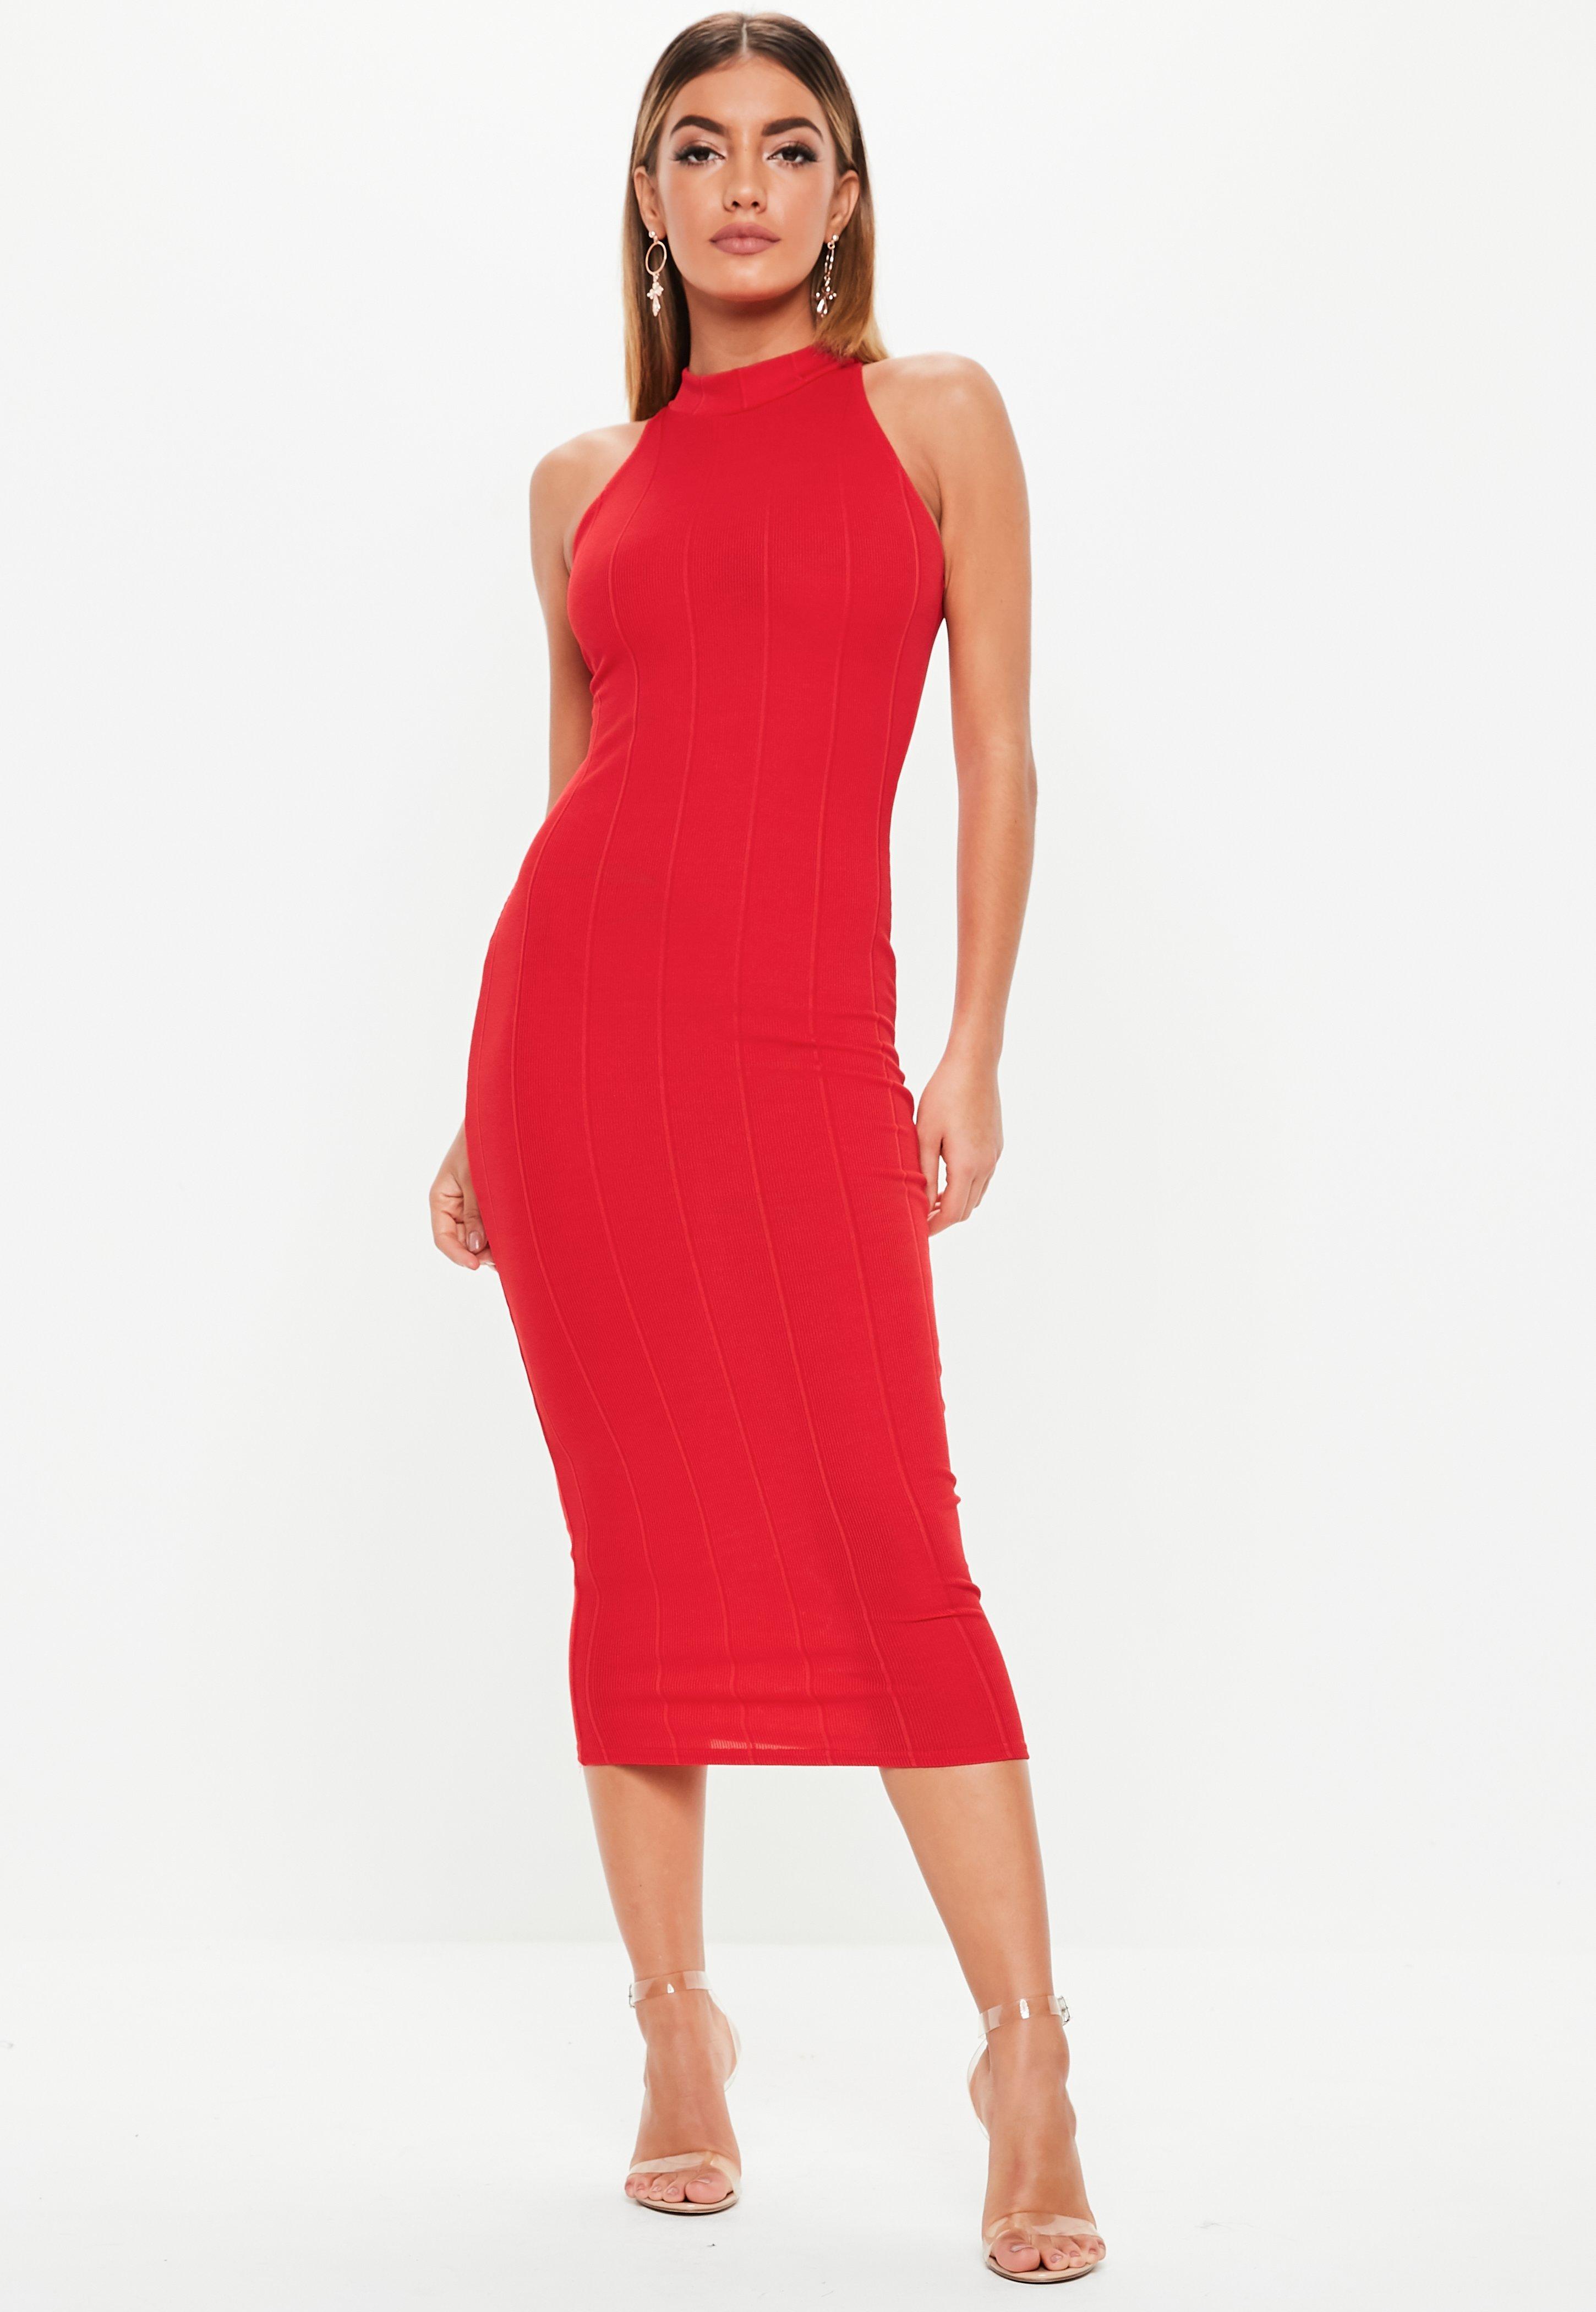 1d397da3fdf9c Red High Neck Bandage Midi Dress